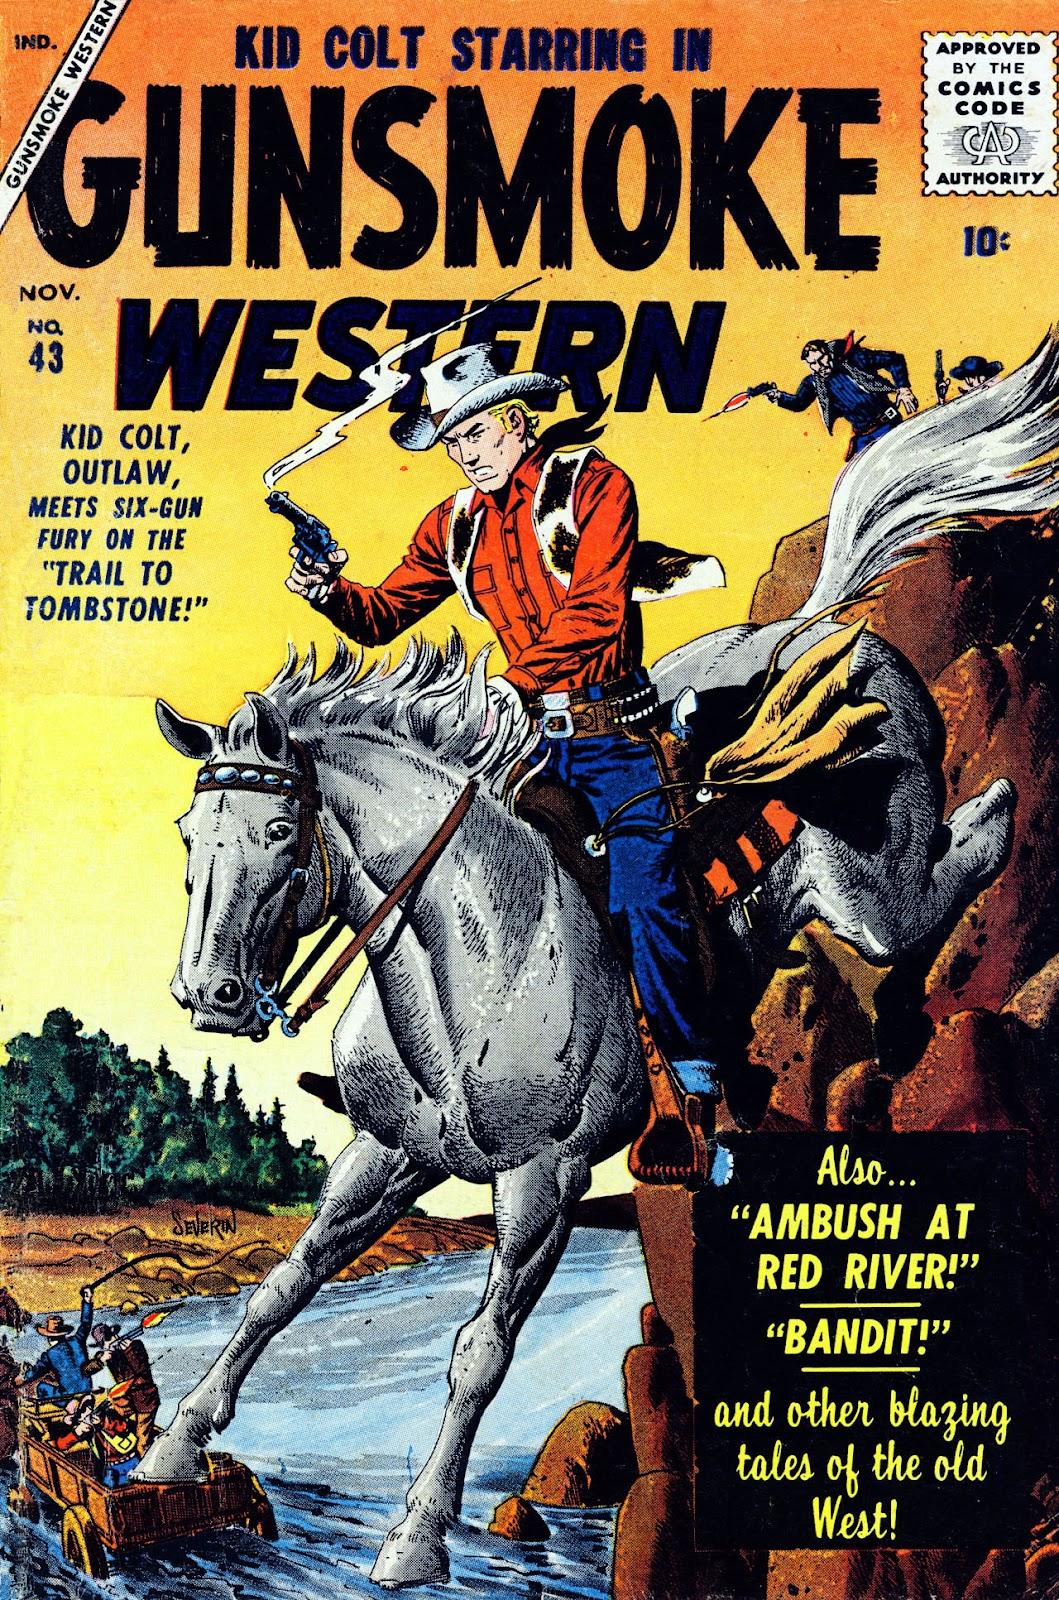 Gunsmoke Western issue 43 - Page 1